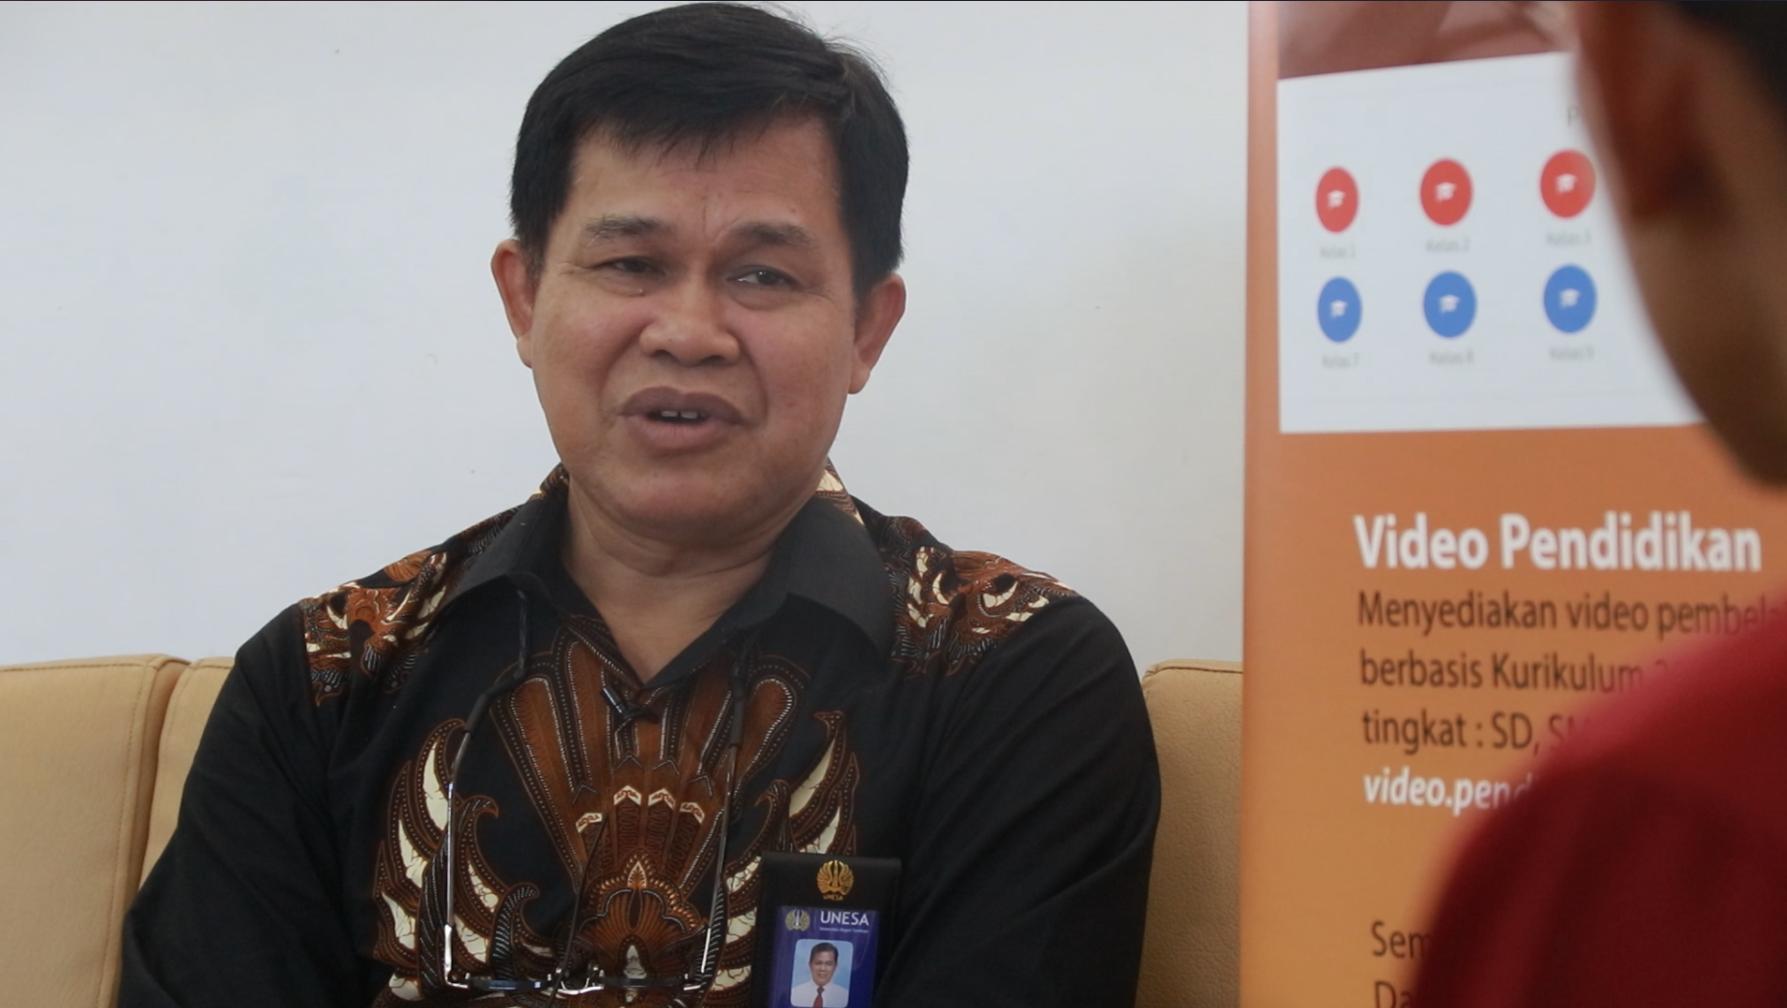 Prof. Djodjok Soepardjo: Pemanfaatan Teknologi Digital untuk Perkembangan Pendidikan itu Sangat Perlu